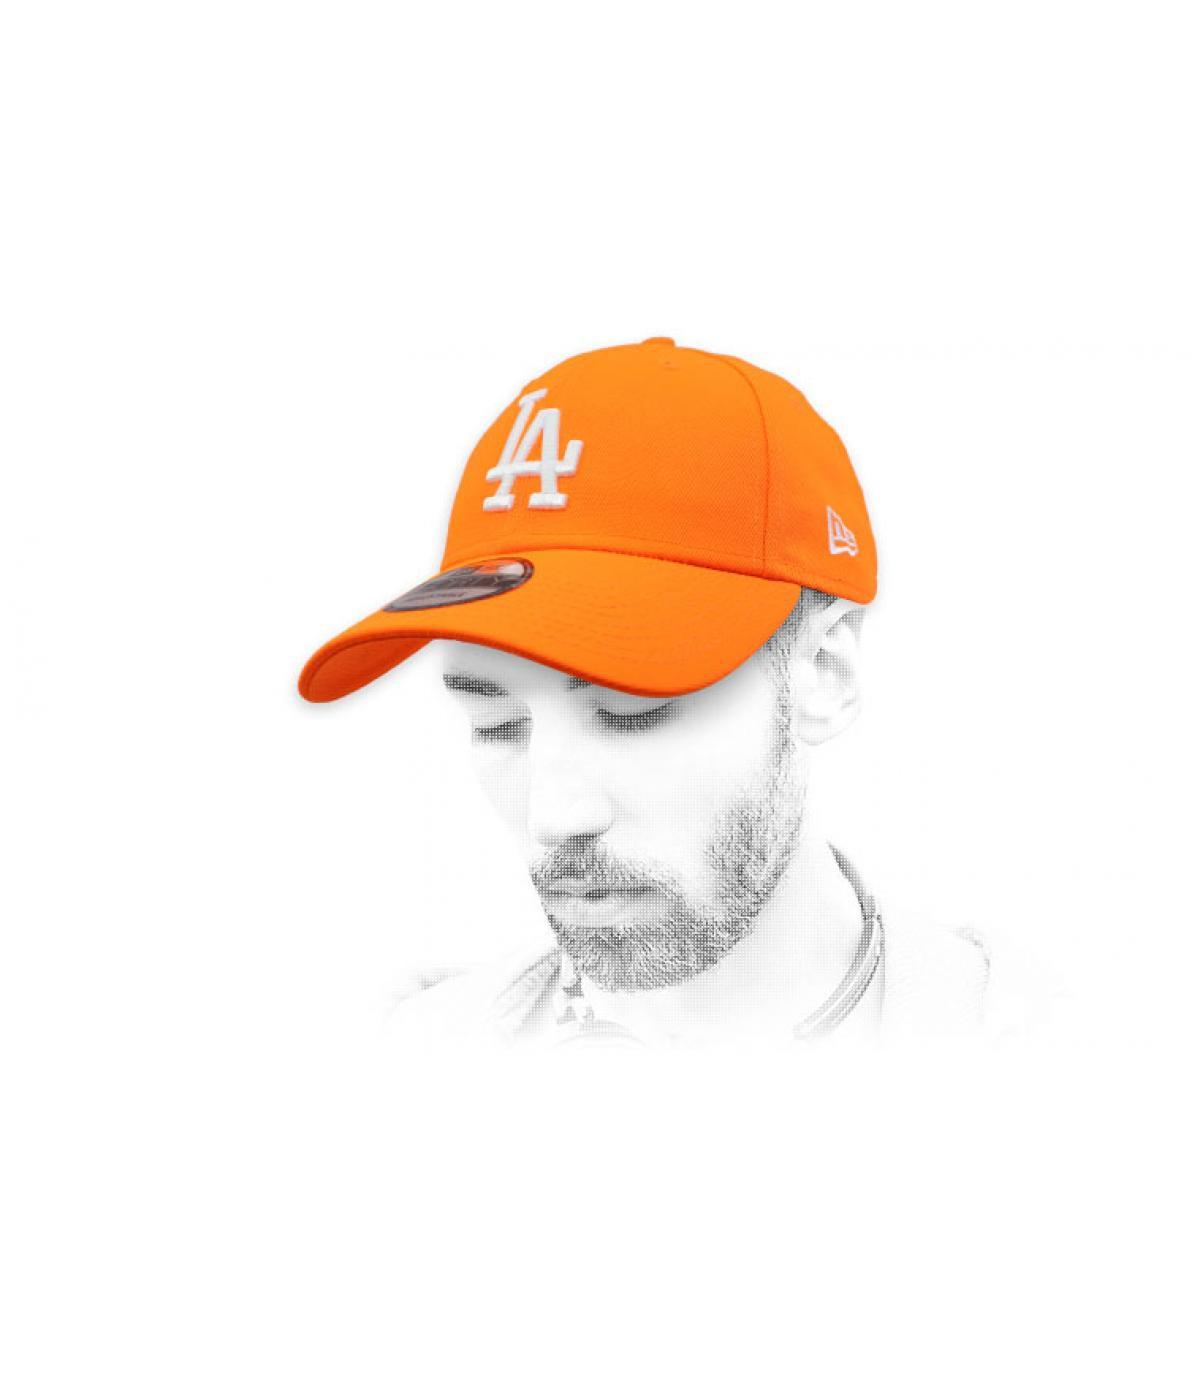 gorra LA naranja